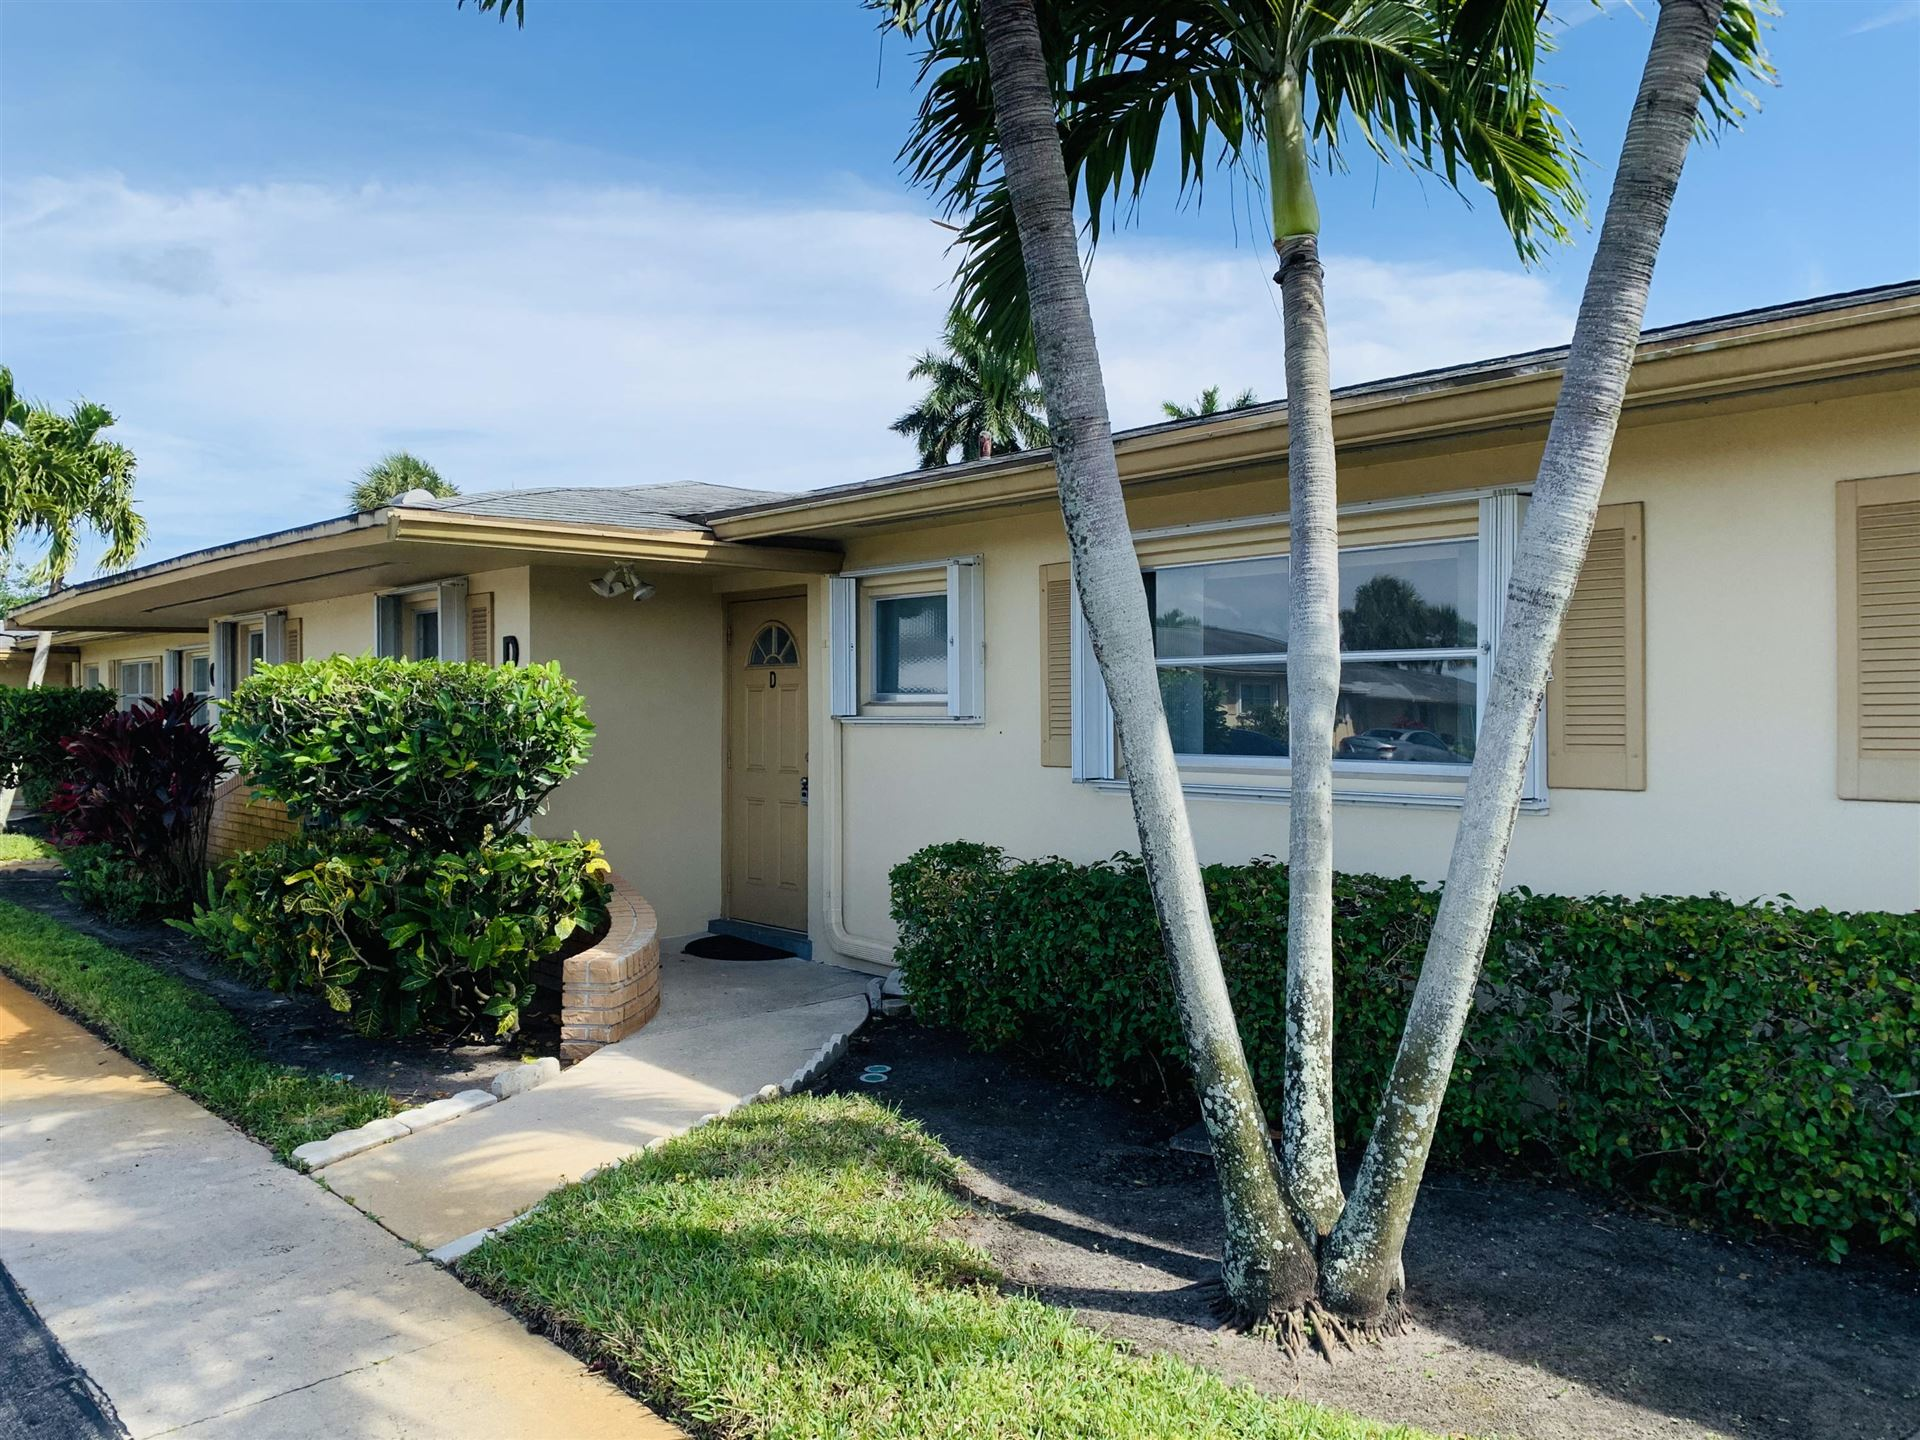 2601 Barkley Drive W #D, West Palm Beach, FL 33415 - #: RX-10688189